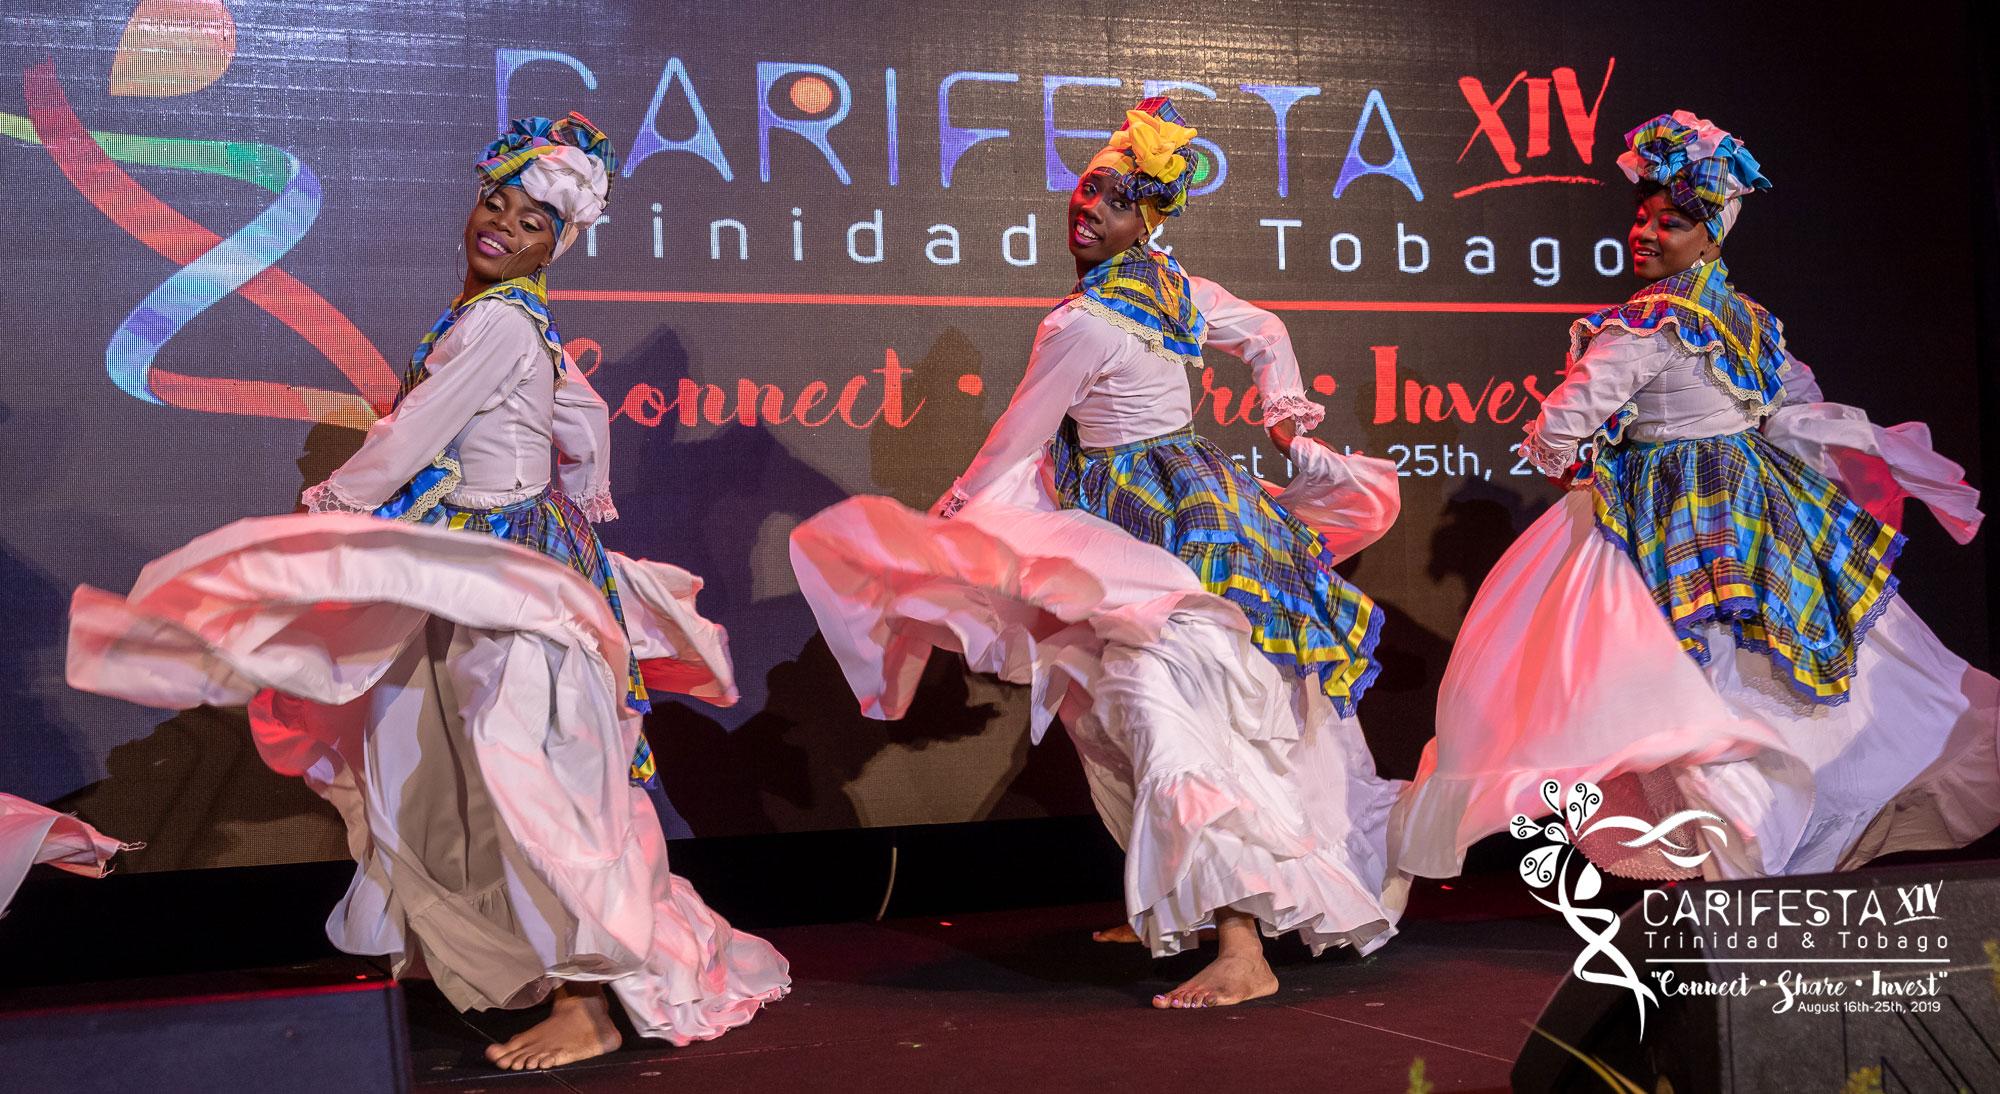 CARIFESTA XIV, Trinidad & Tobago - August 16 -25, 2019